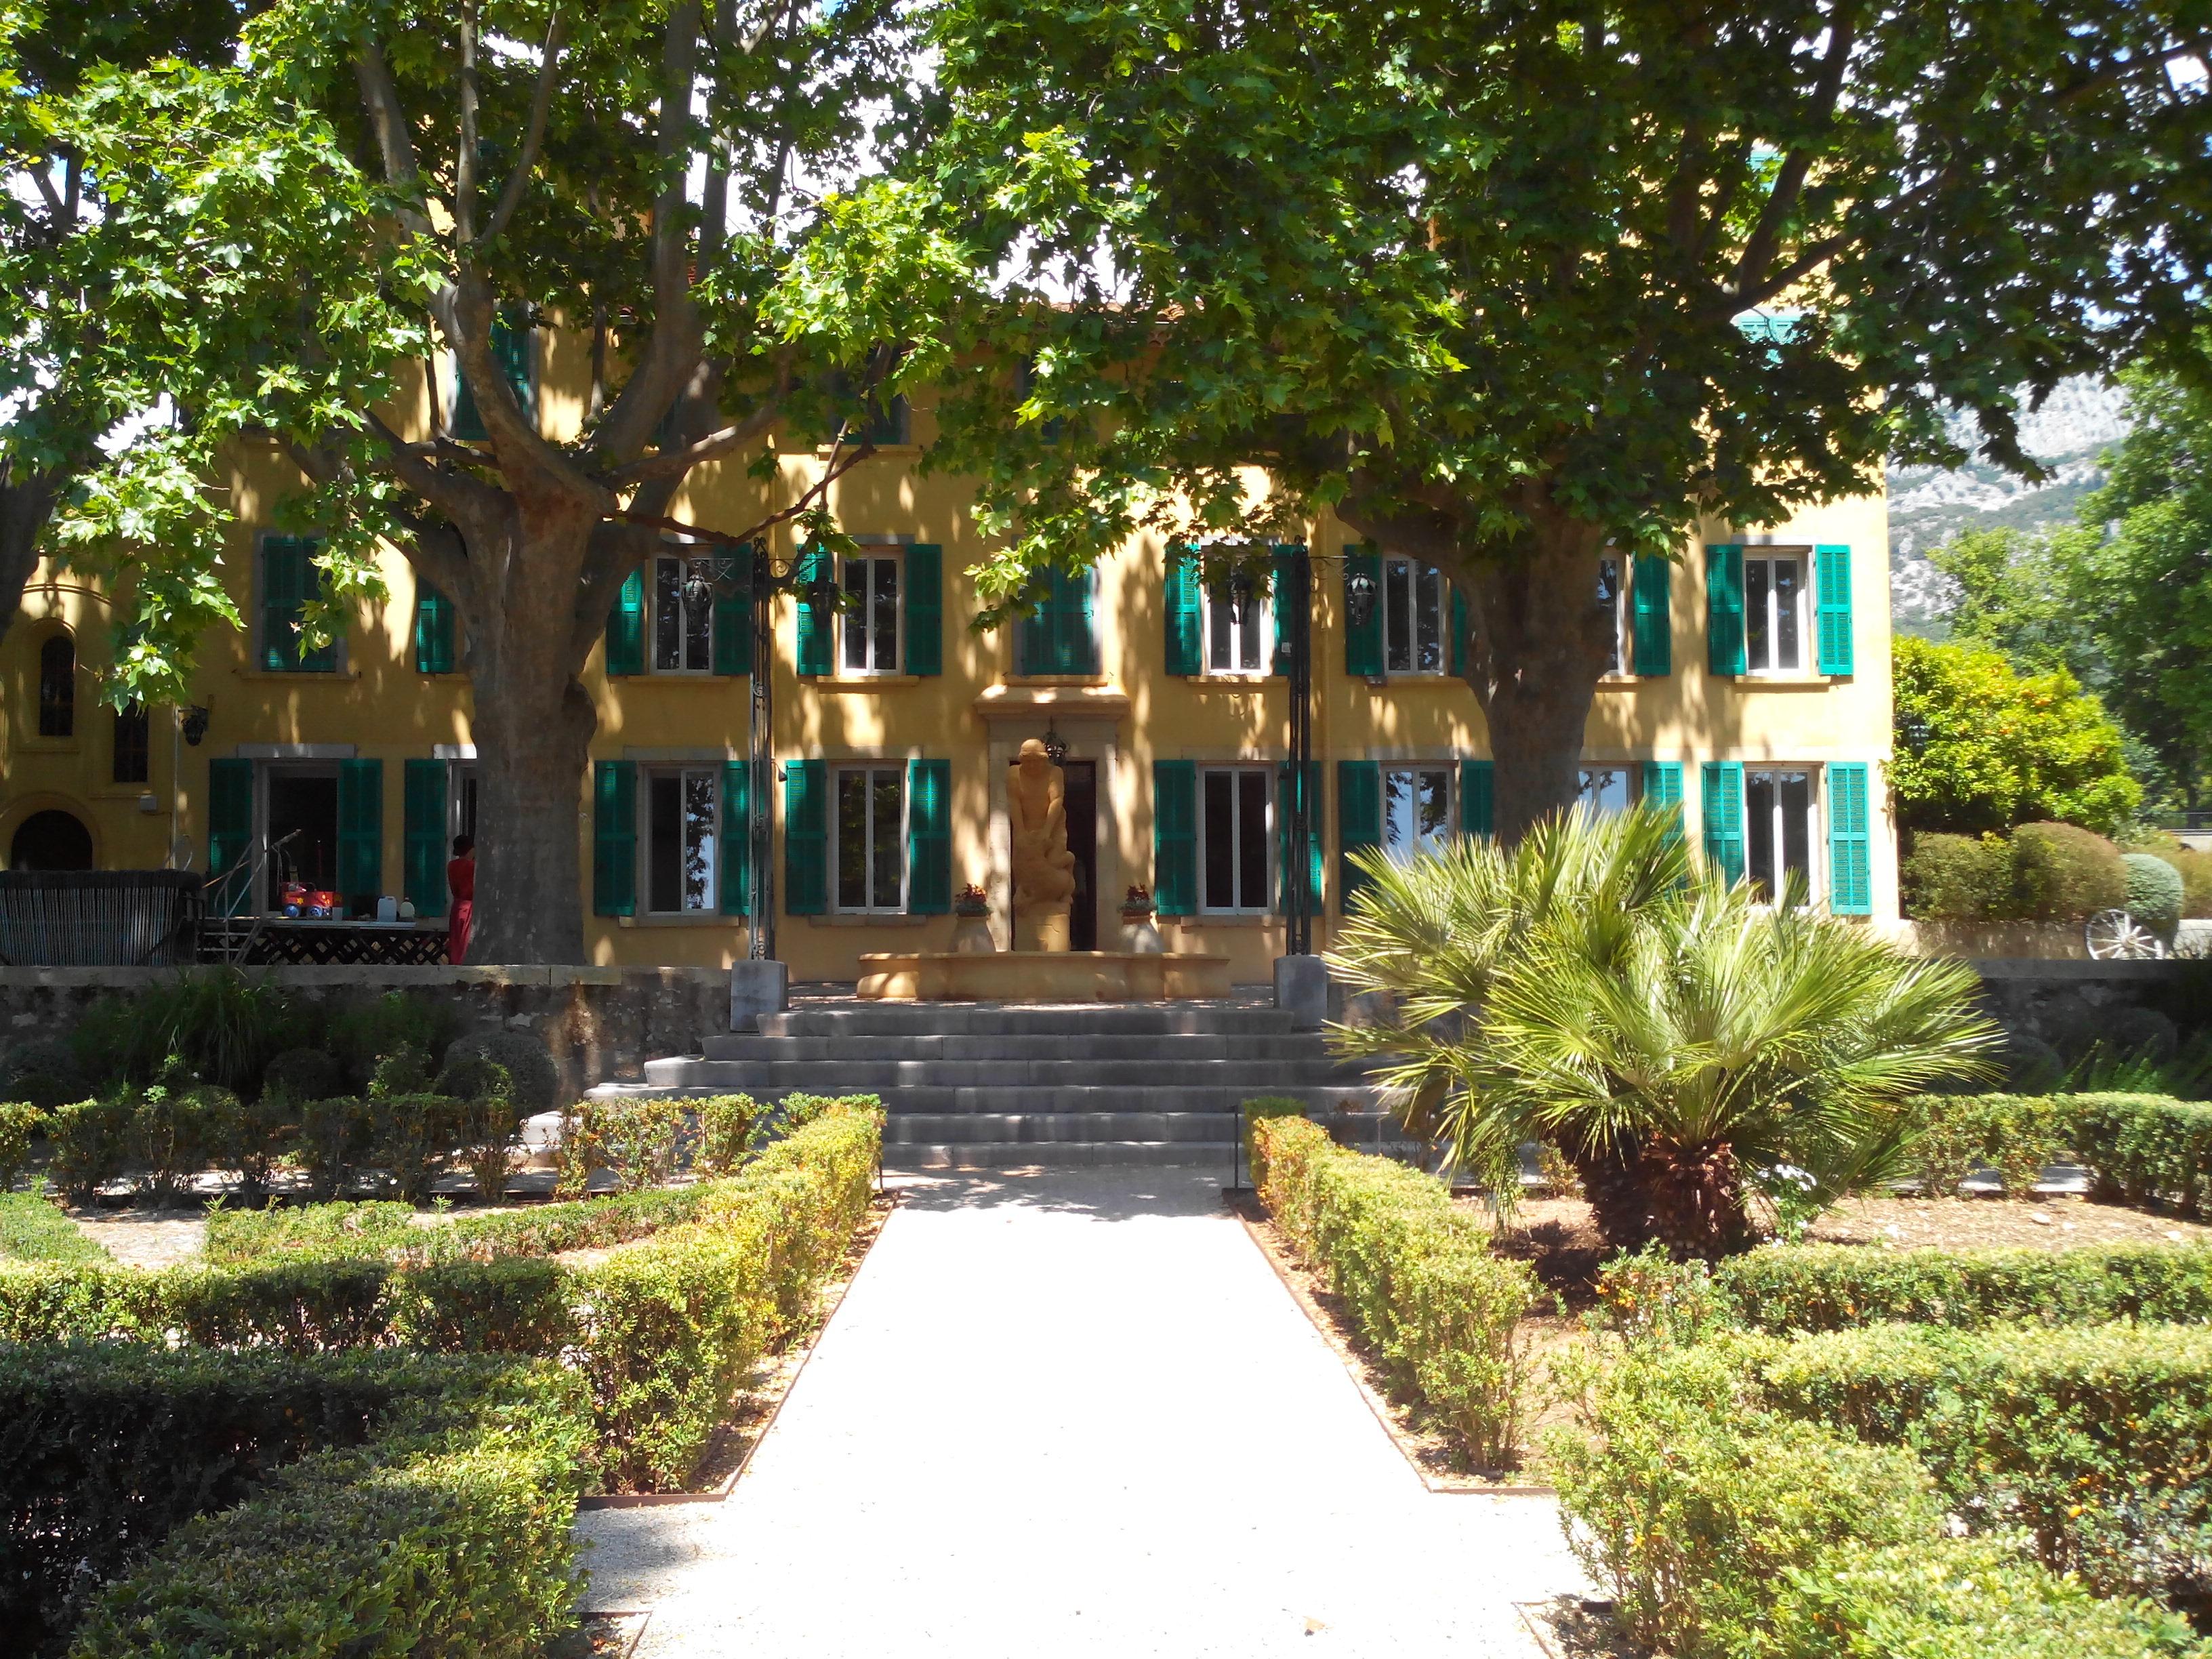 Une balade au jardin de baudouvin for Au jardin des colibris tripadvisor